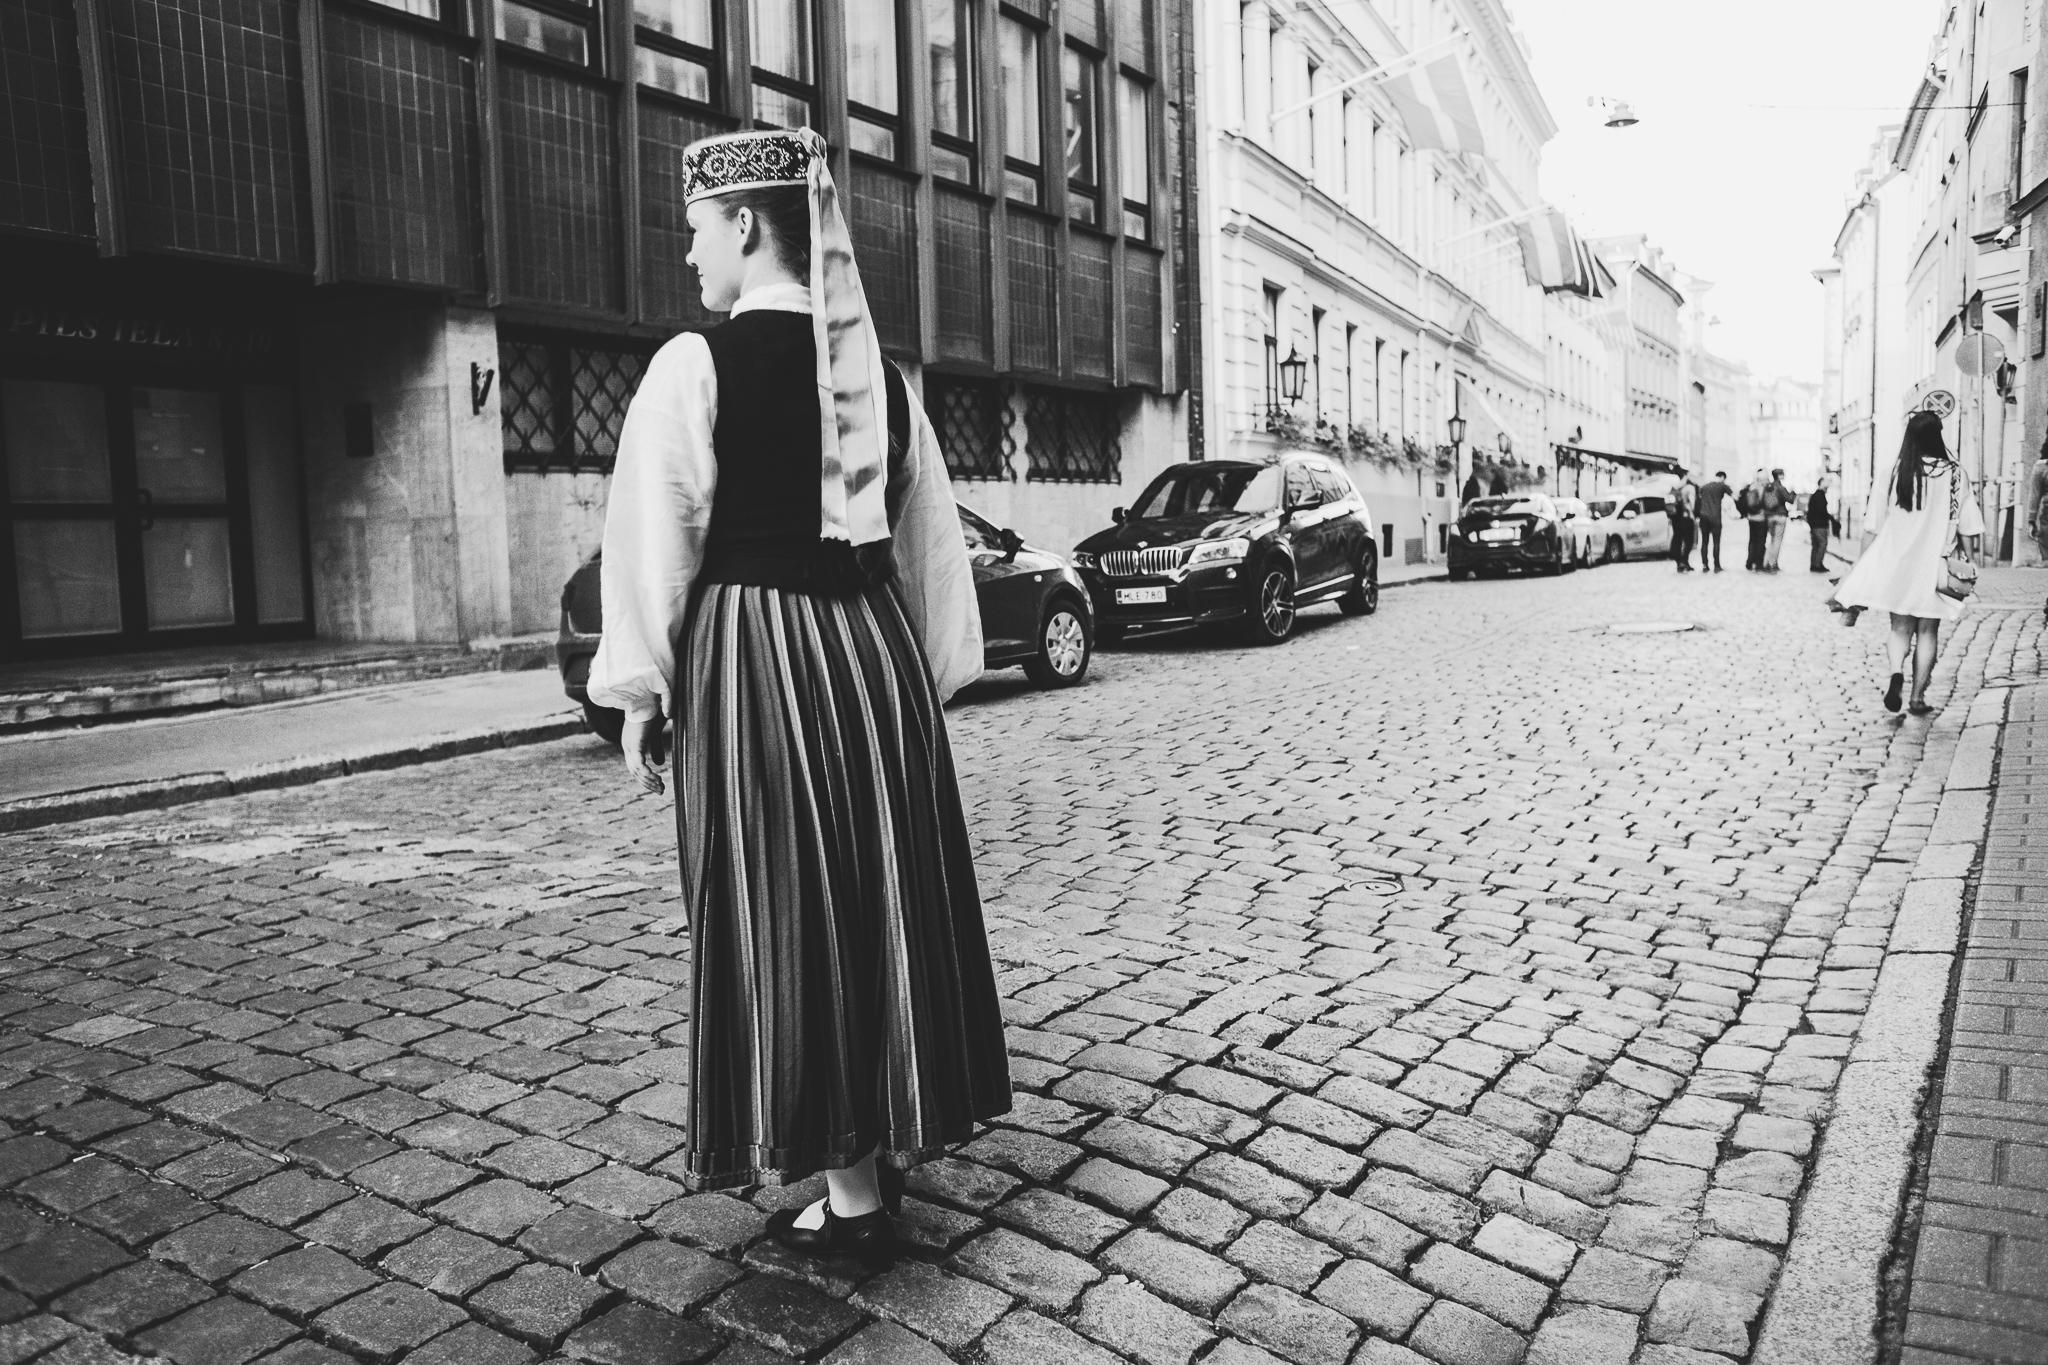 Photographer: Linda Migla | Liesma